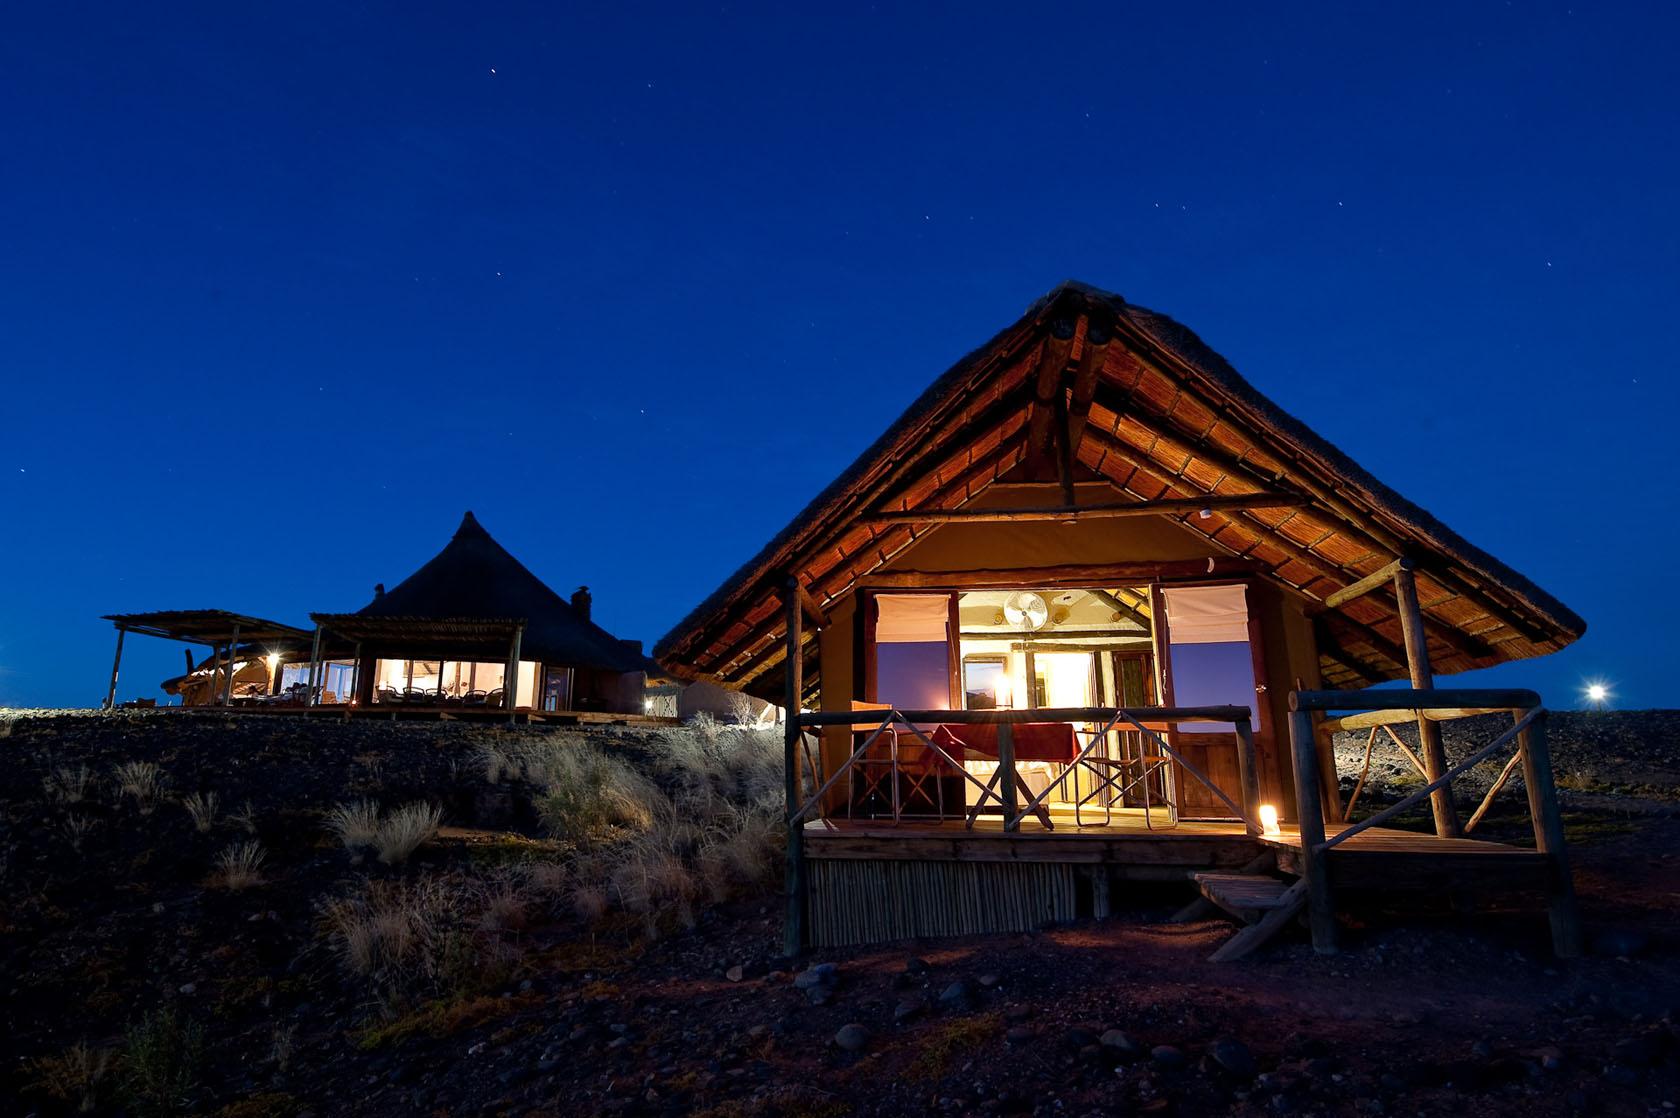 Namibia - 1552 - Kulala Desert Lodge - night sky